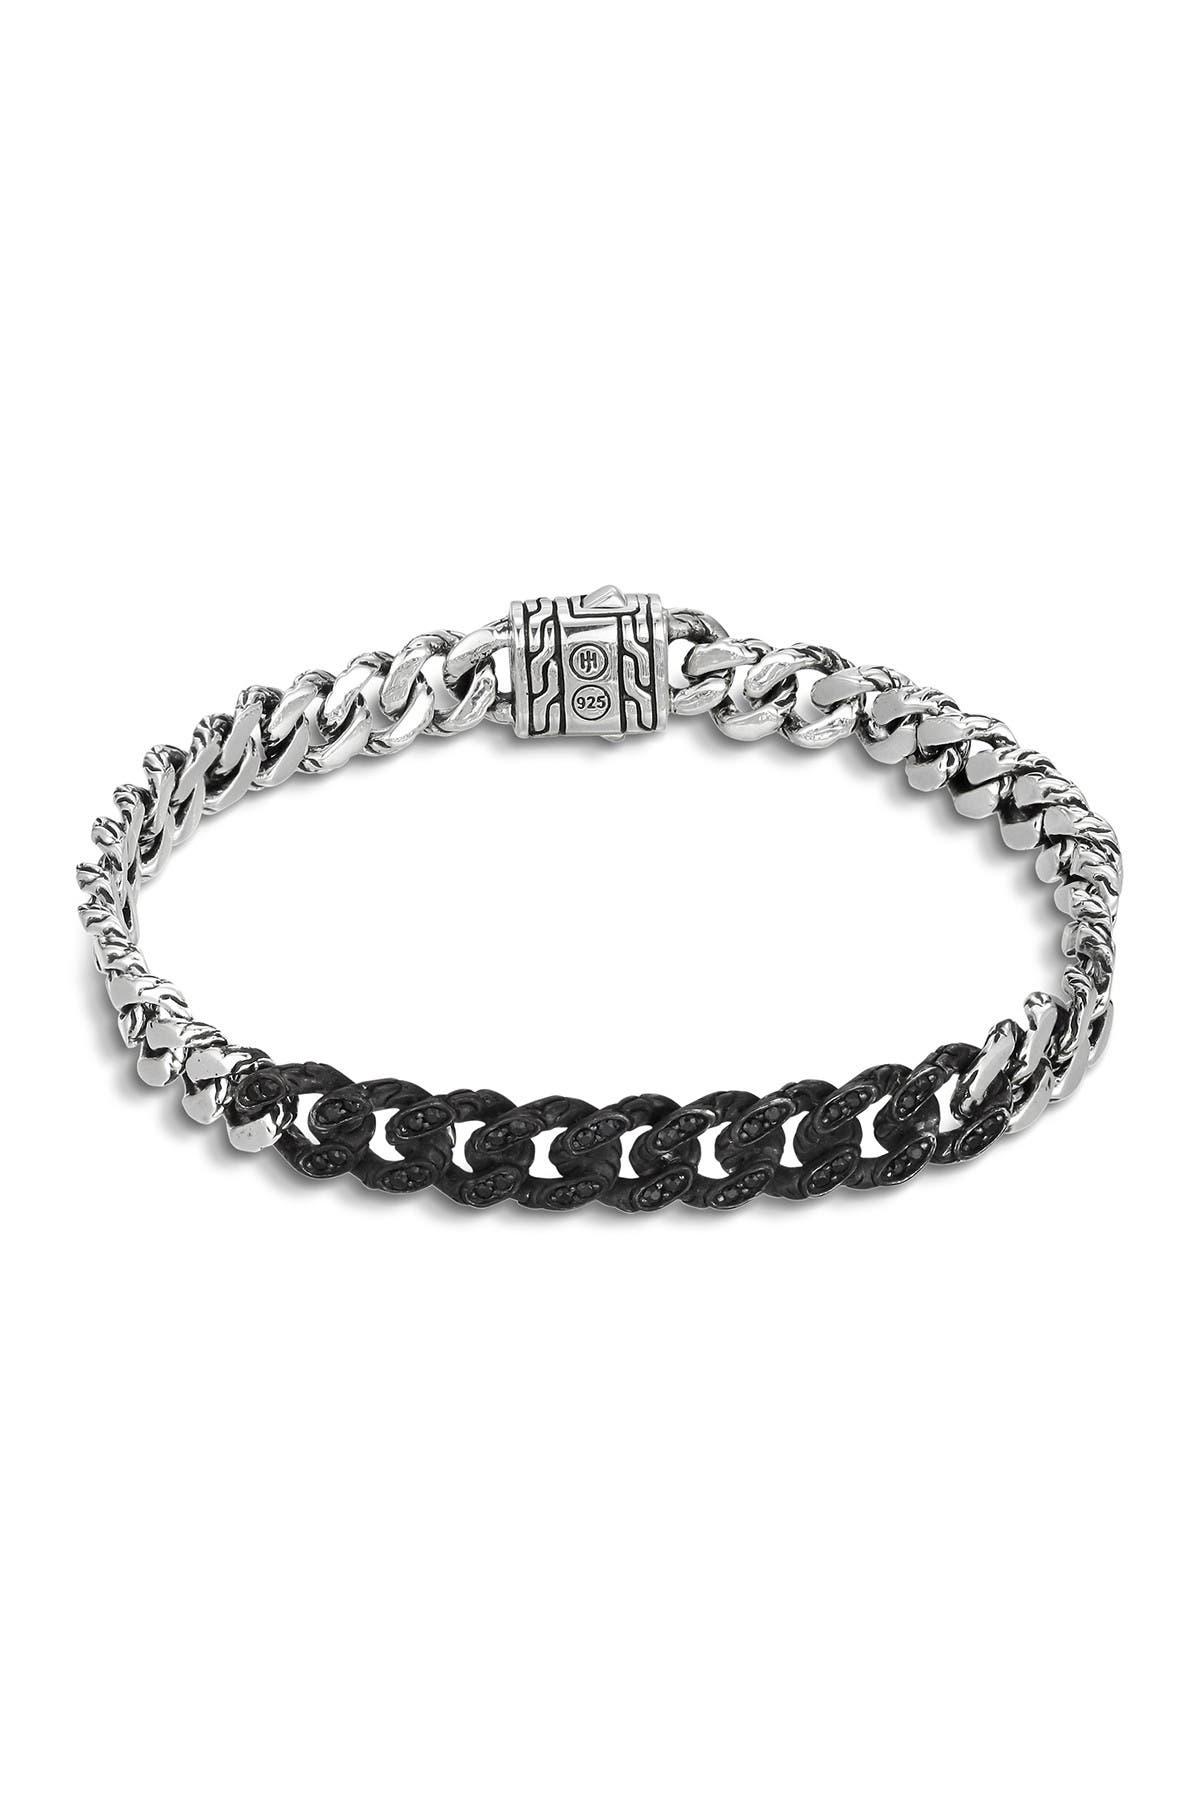 Image of JOHN HARDY Men's Sterling Silver Chain Gourmette Bracelet